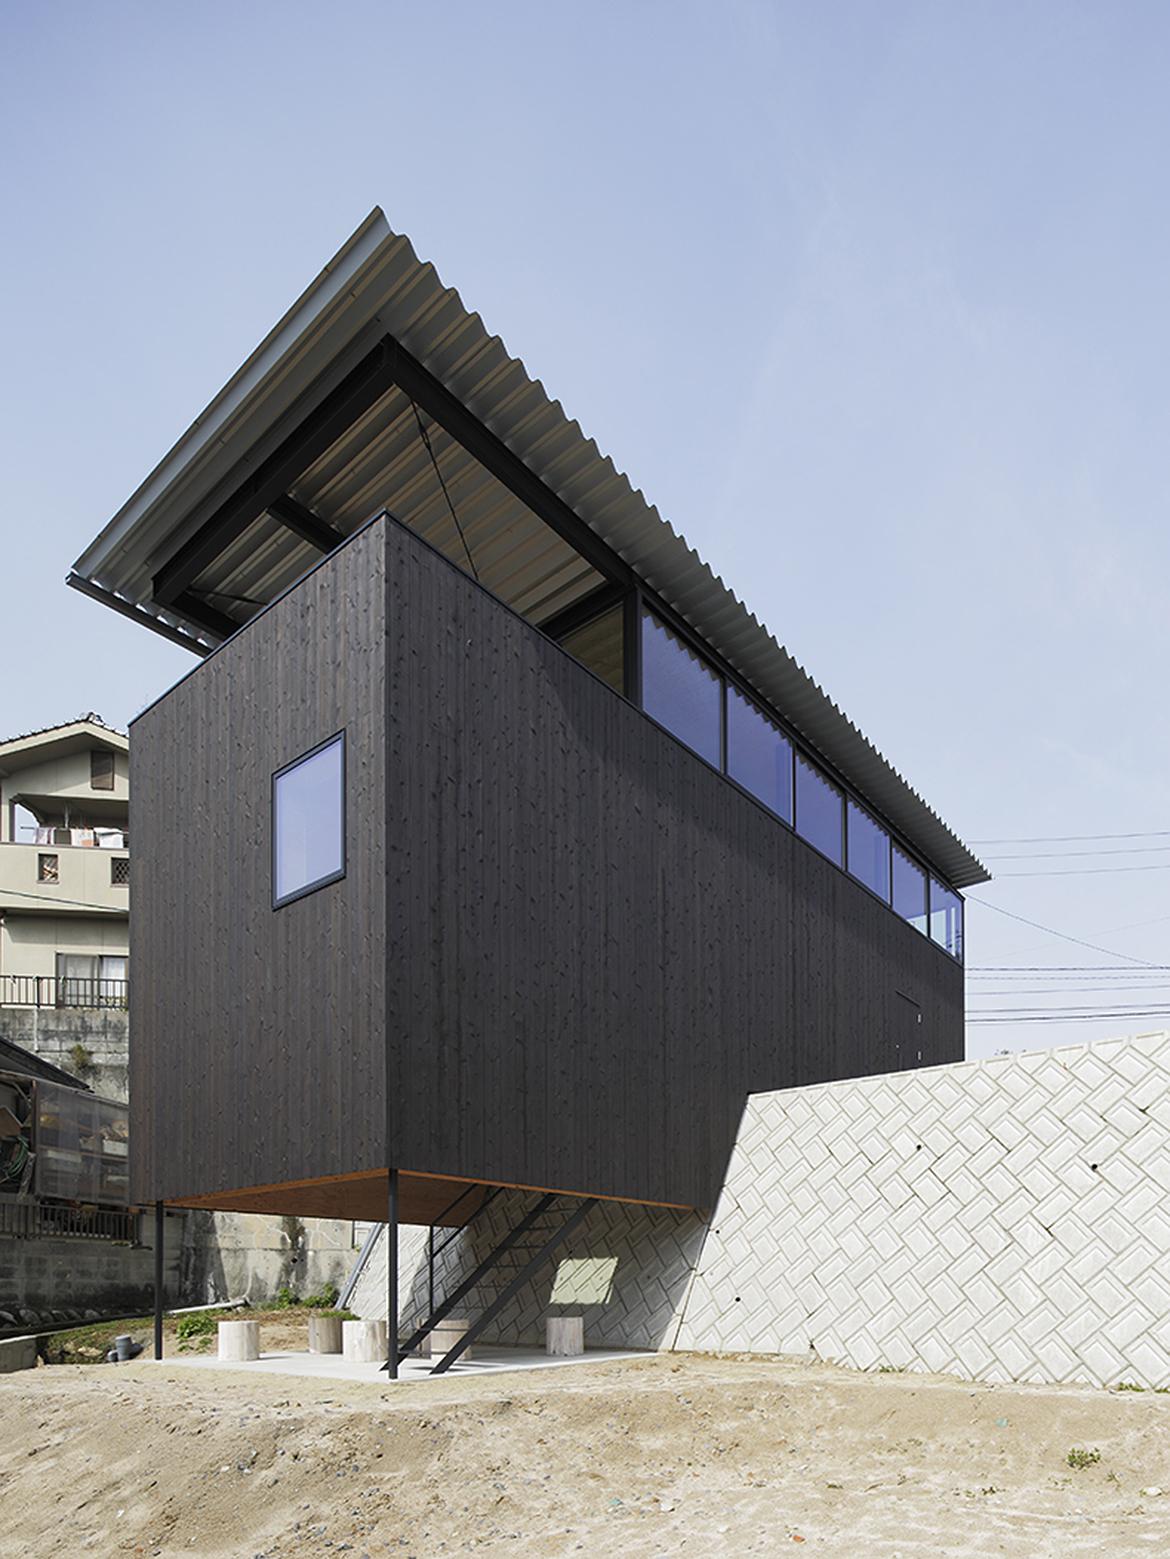 540ea1c3c07a802ff5000177_house-in-miyake-hidetaka-nakahara-architects-yoshio-ohno-architects_portada